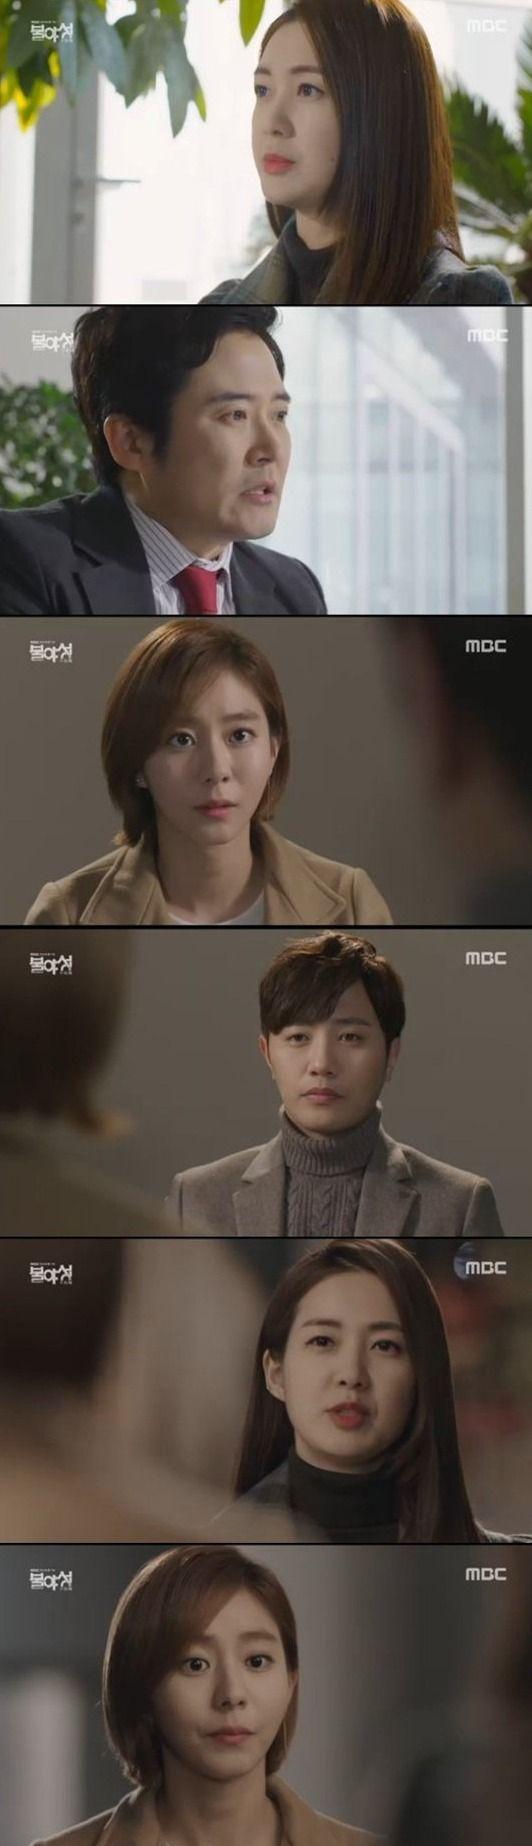 Night light korean drama synopsis -  Spoiler Added Episode 16 Captures For The Kdrama Night Light